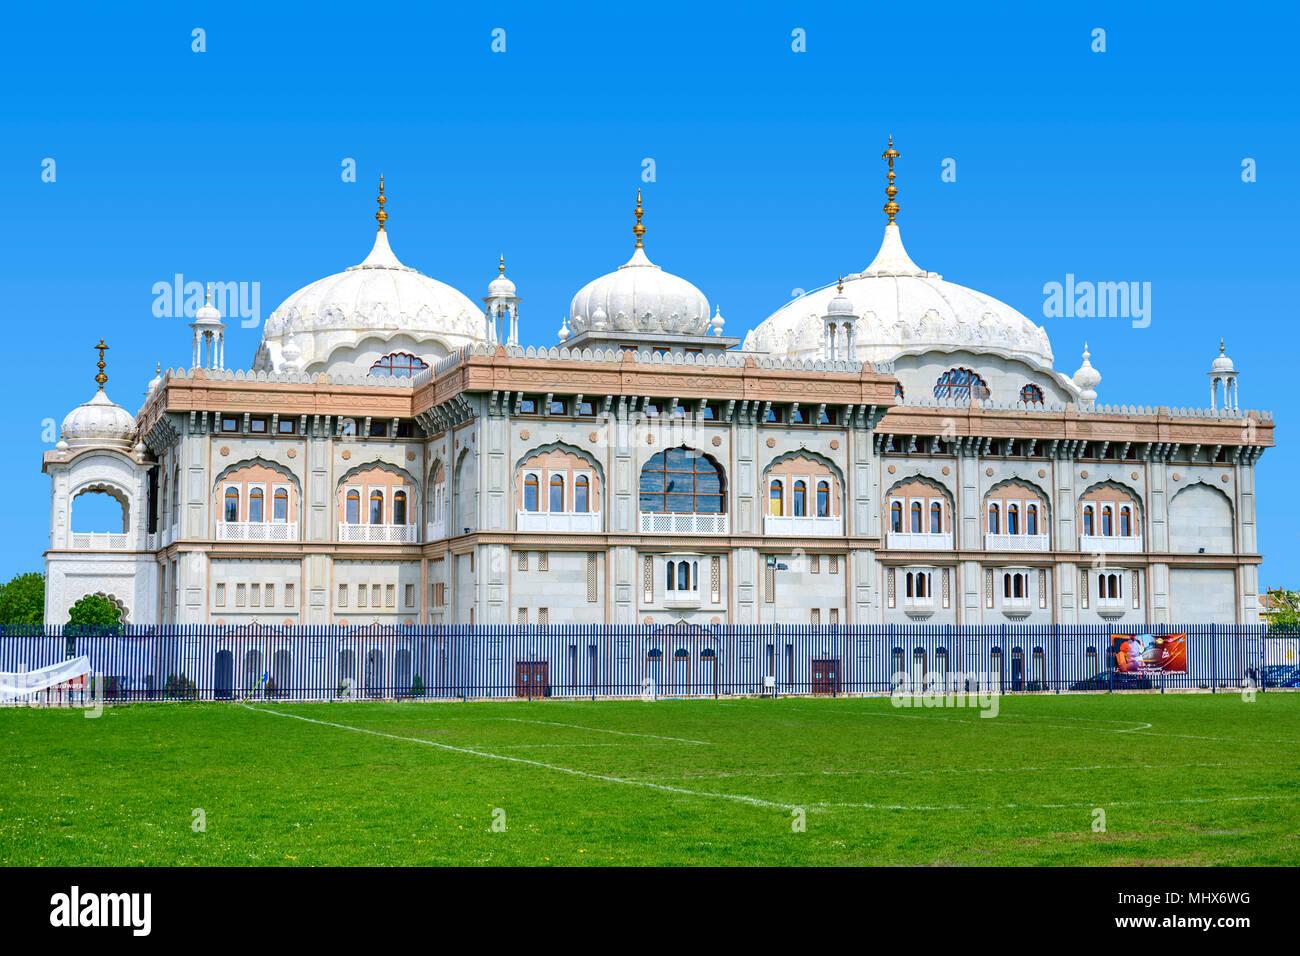 Guru Nanak Darbar Gurdwara, the magnificent sikh temple ( Gurdwara )  in Gravesend Kent - Stock Image